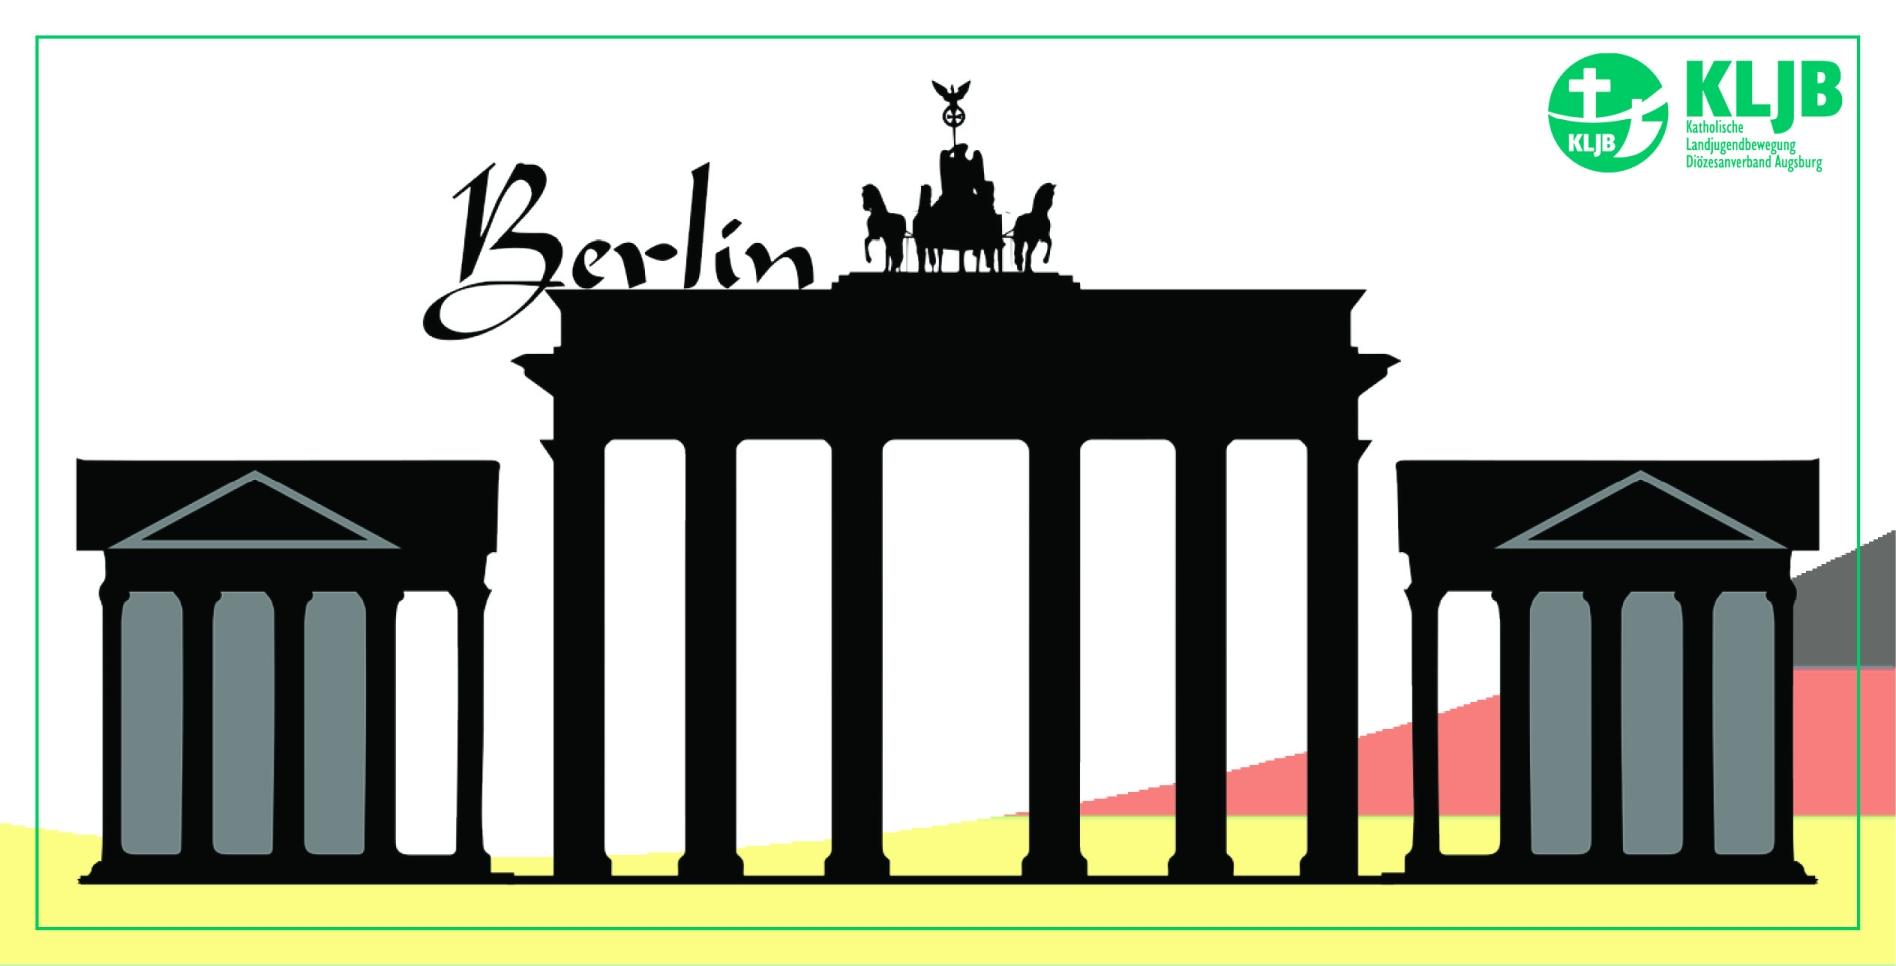 IGW-Fahrt 2018